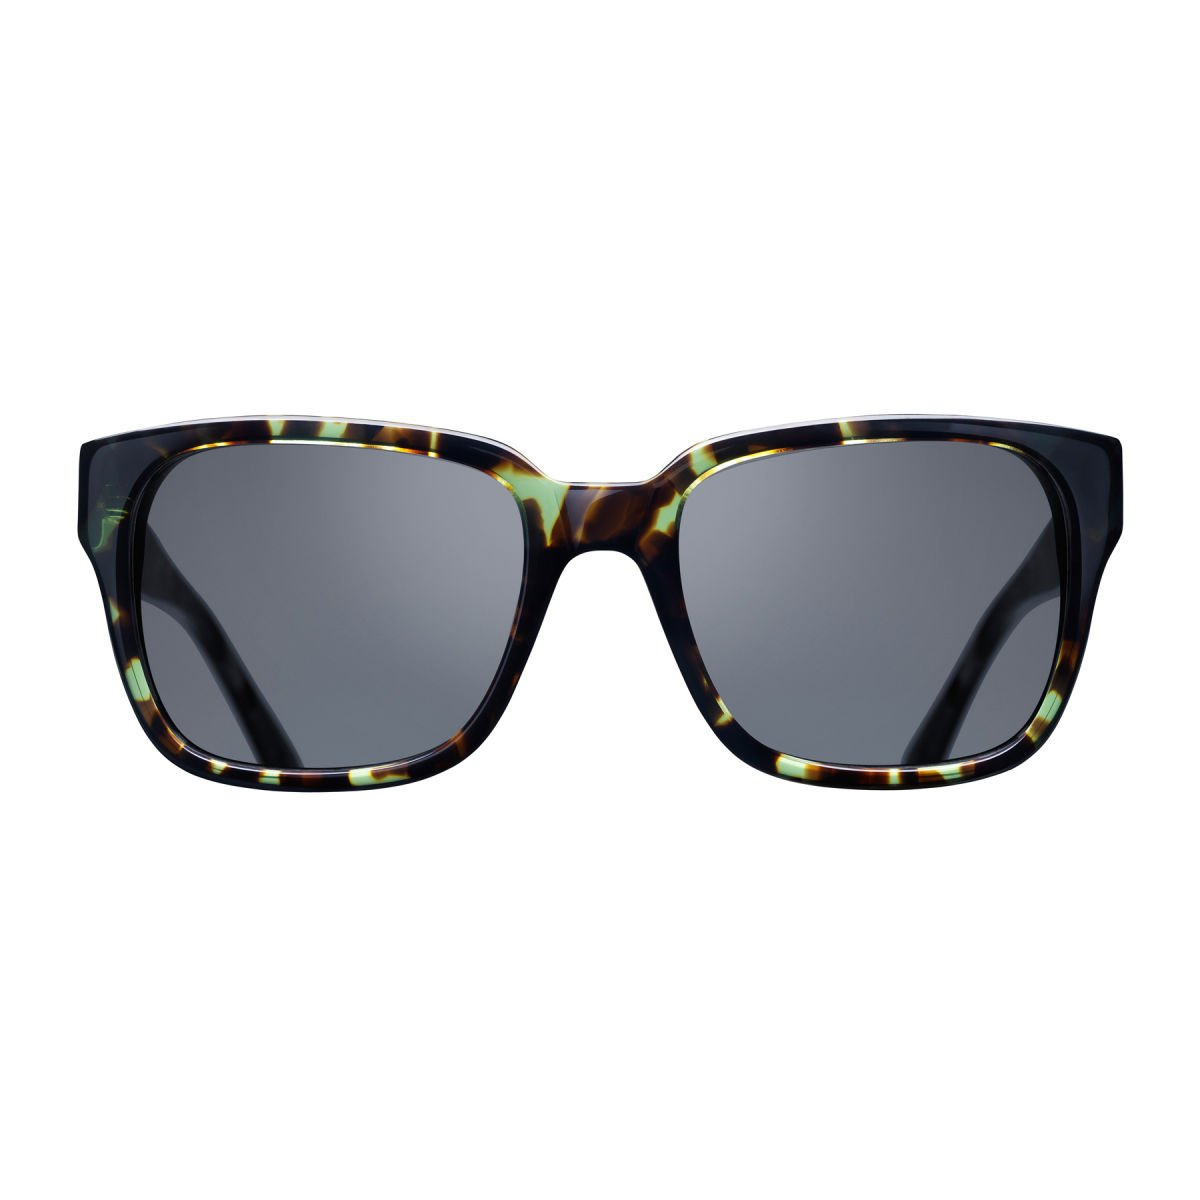 0d222dd94417 Amazon.com: Triwa Men's Lector Wayfarer Sunglasses, Green Turtle &  Transparent Green Temple Tips, 55 mm: Clothing